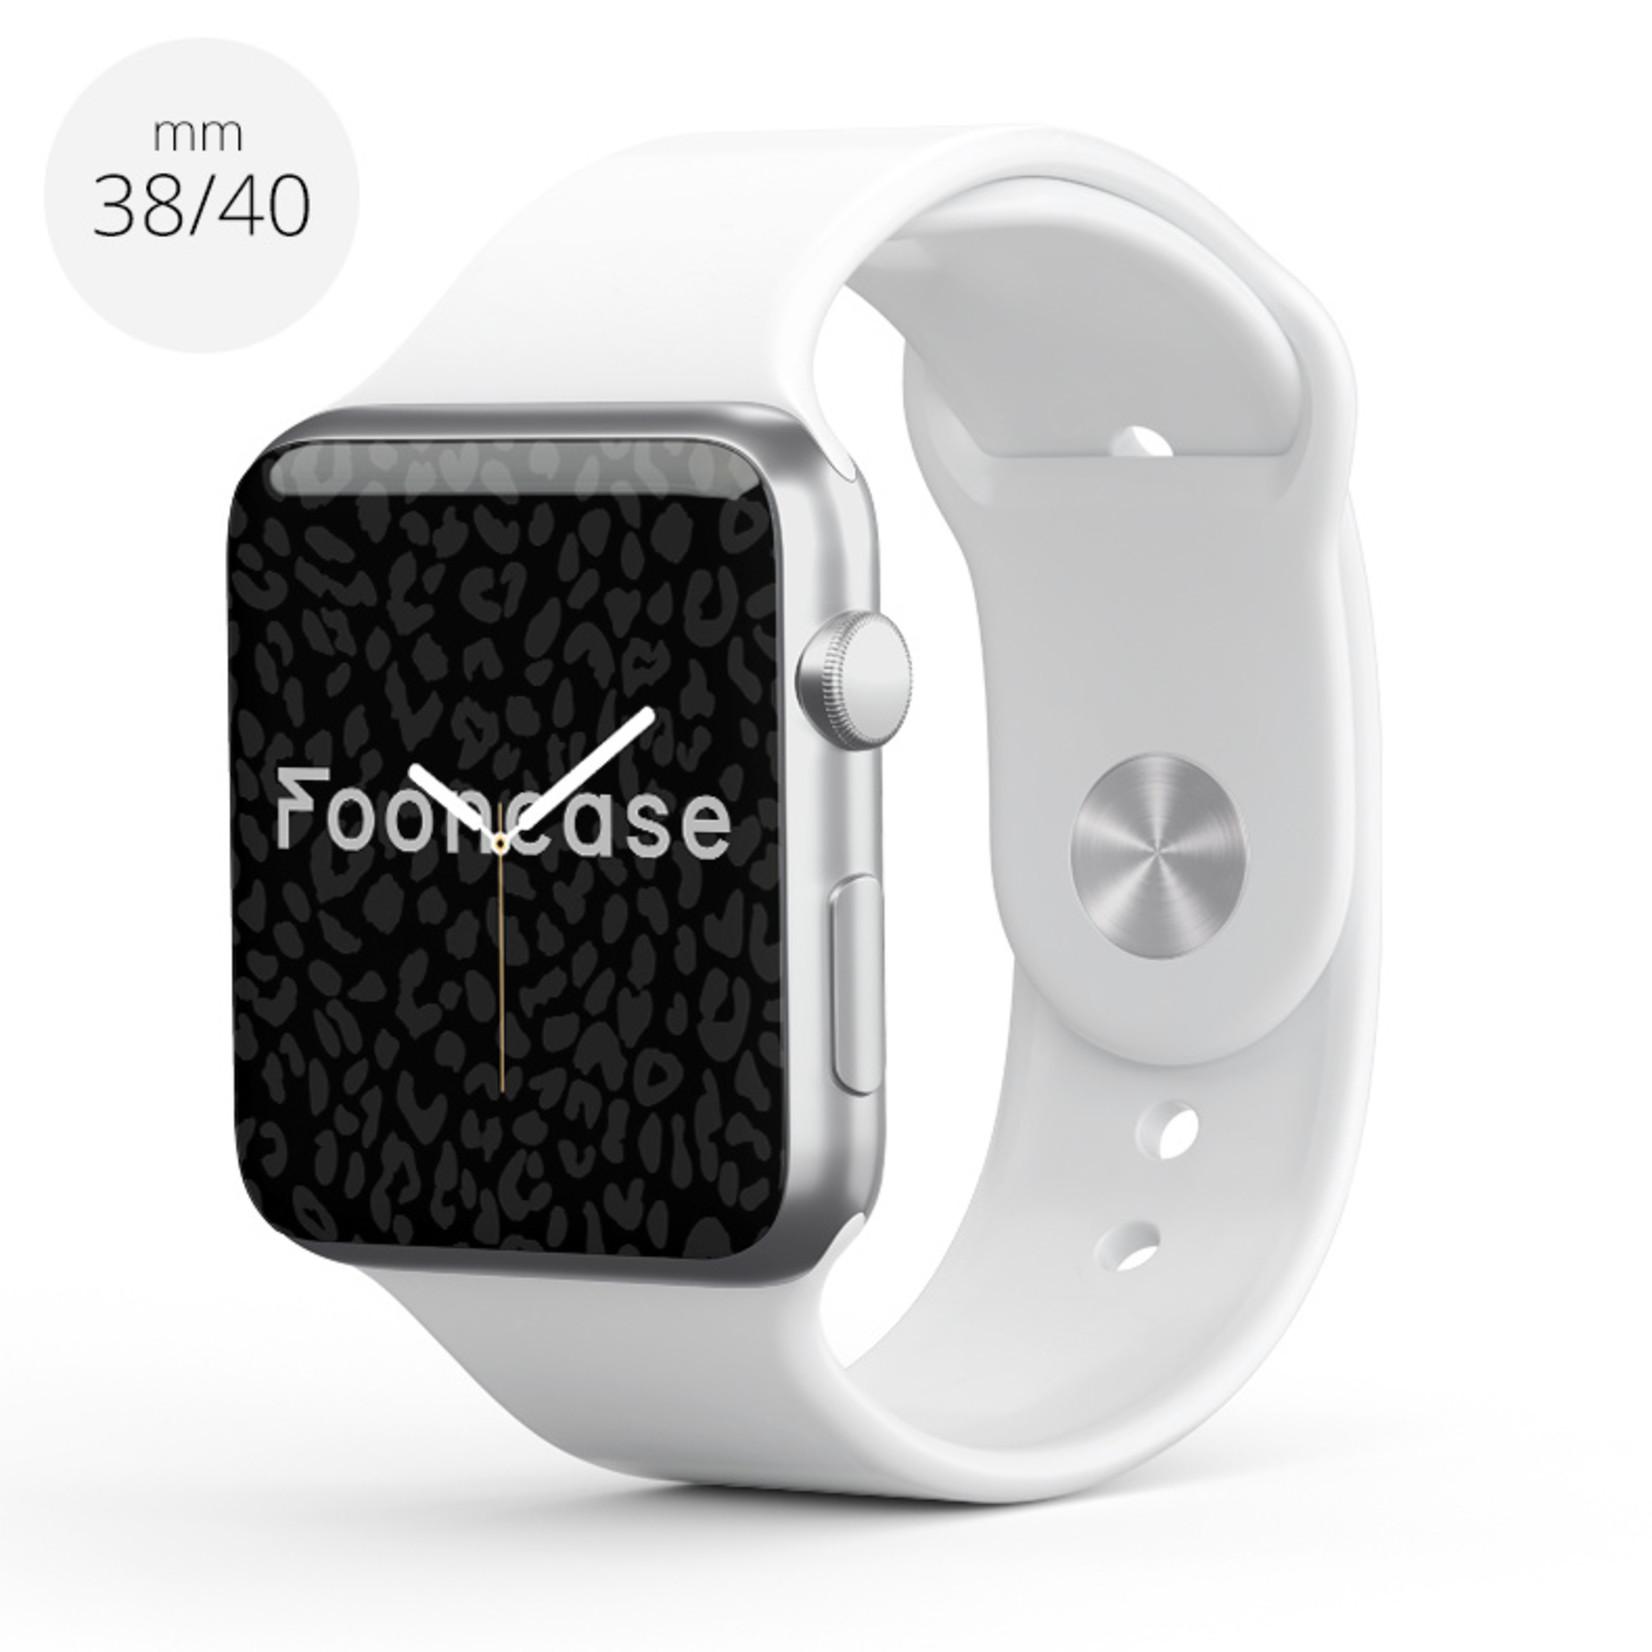 FOONCASE Apple Watch Series (1 t/m 6 / SE) - Weiß - 38/40mm